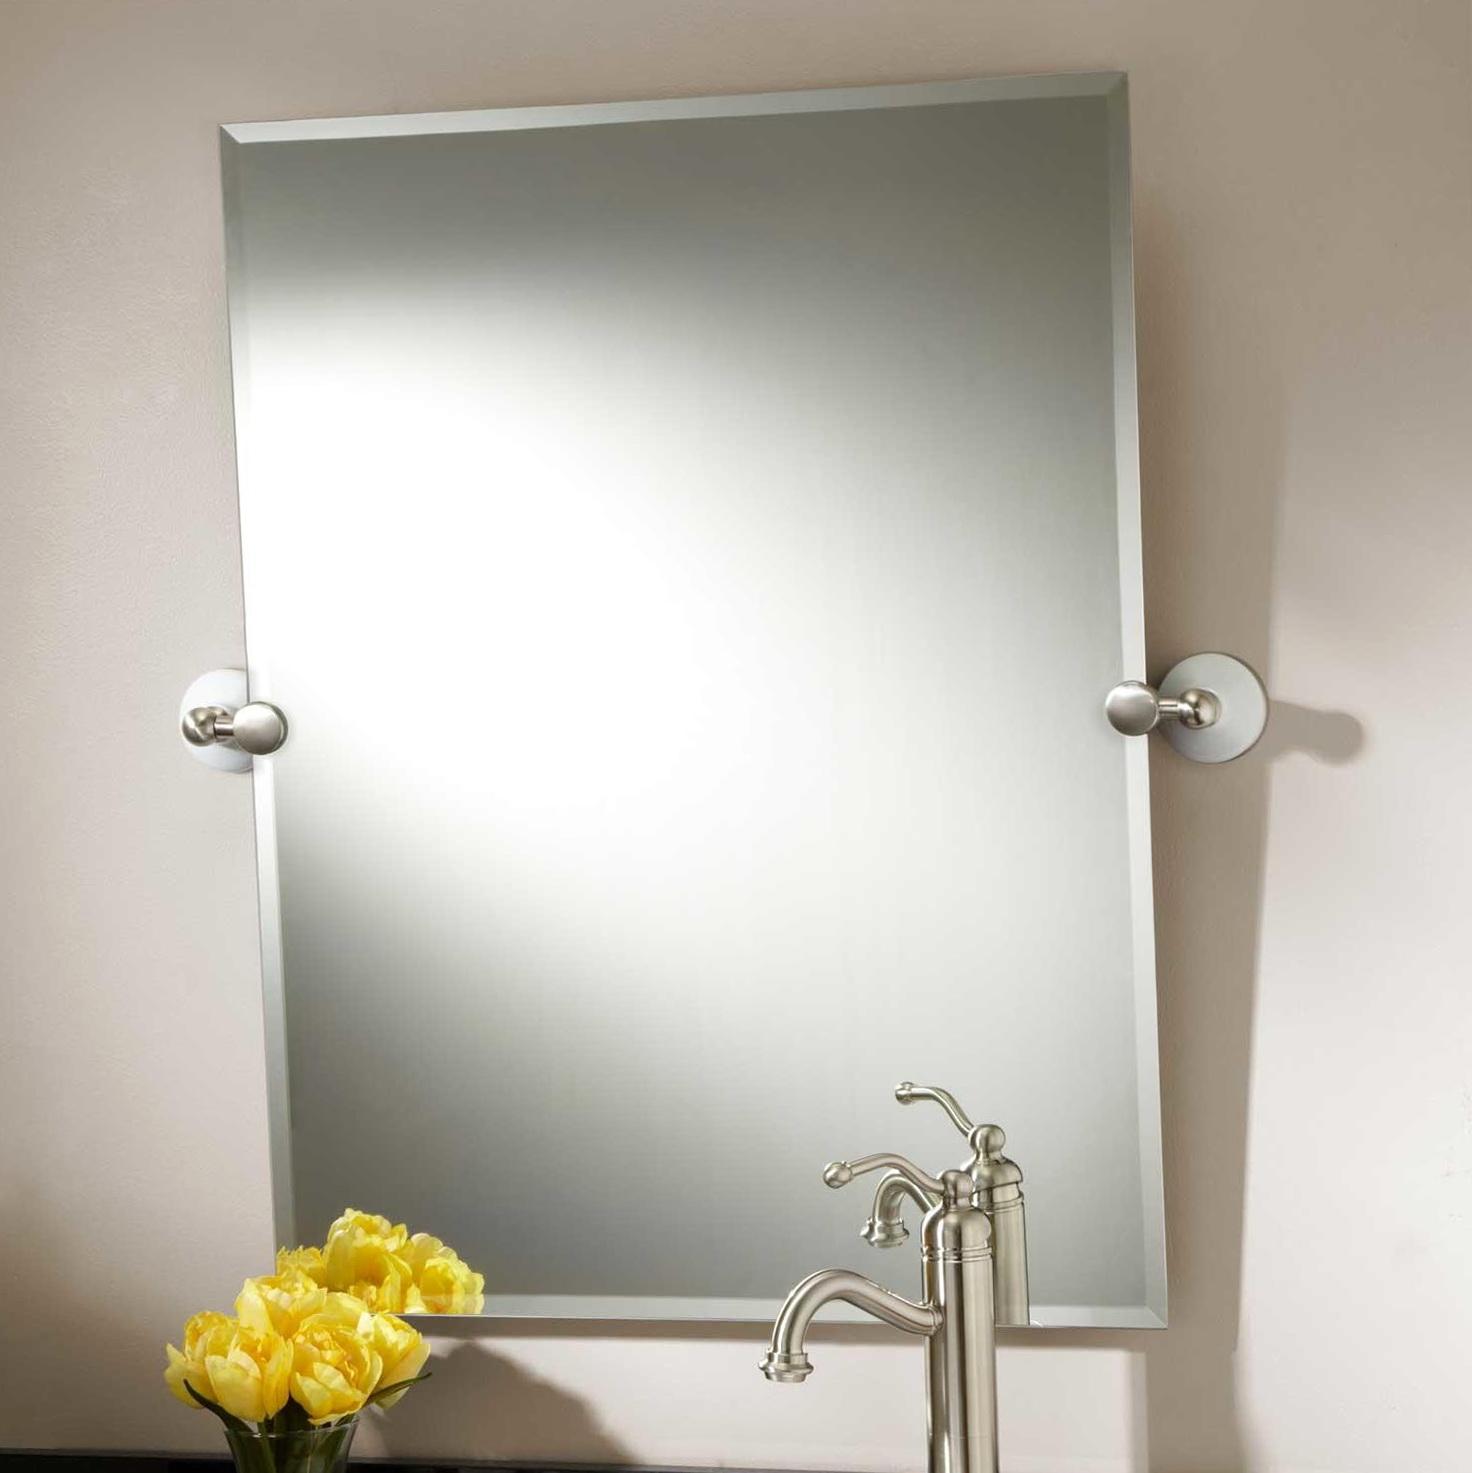 Brushed Nickel Framed Bathroom Mirror